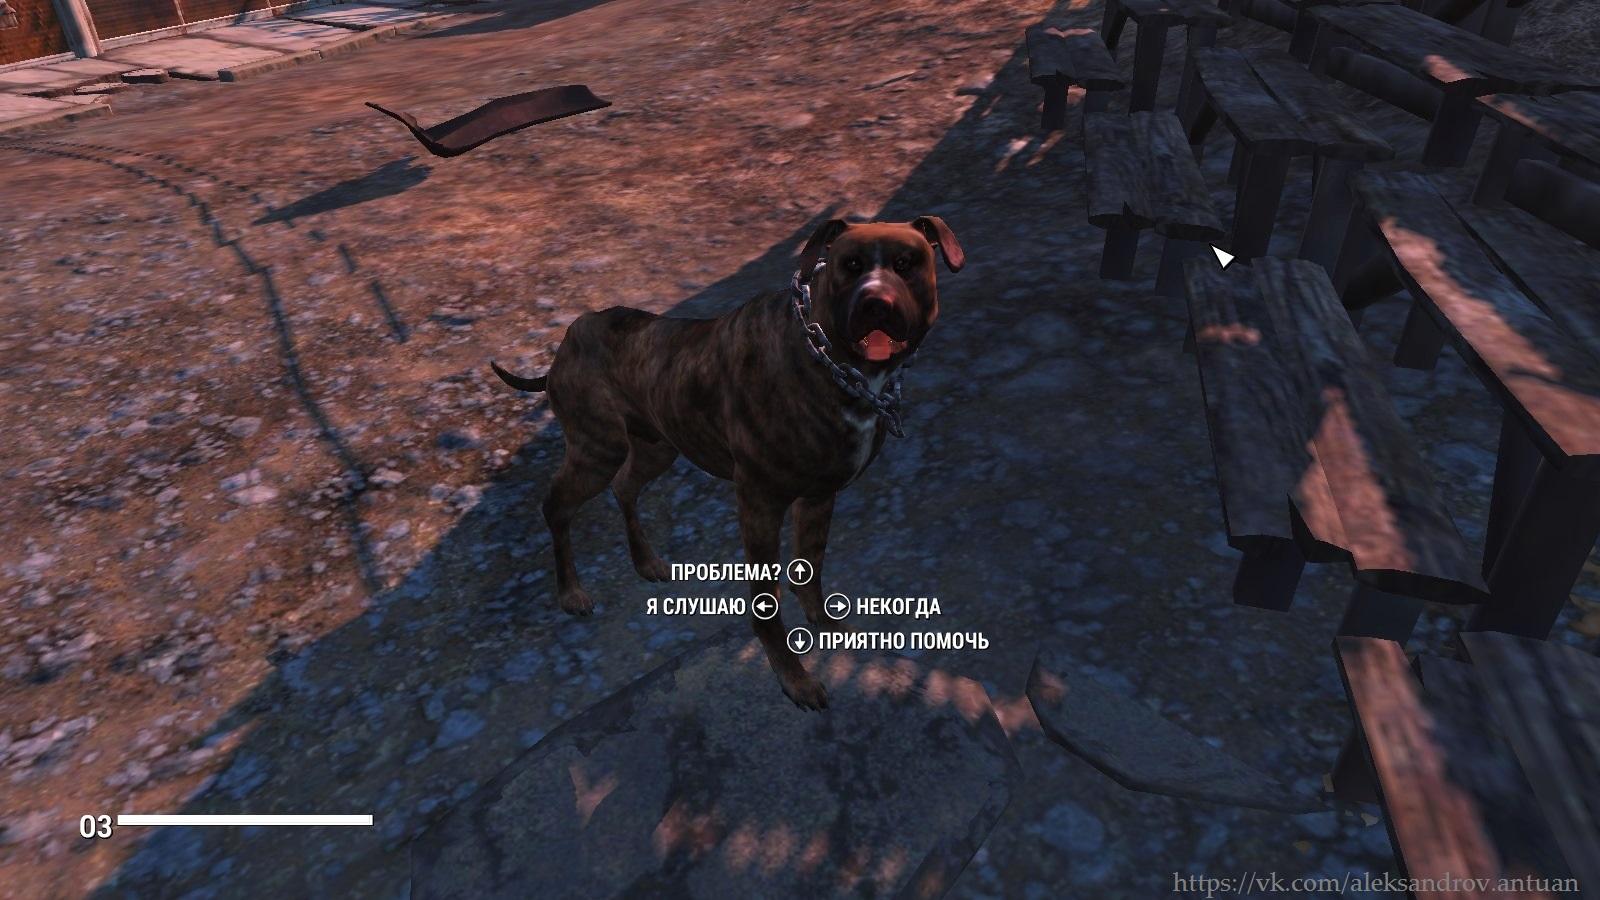 Собака-поселенец. Оборотень ? Скрин не фейковый ... - Fallout 4 поселенец, собака